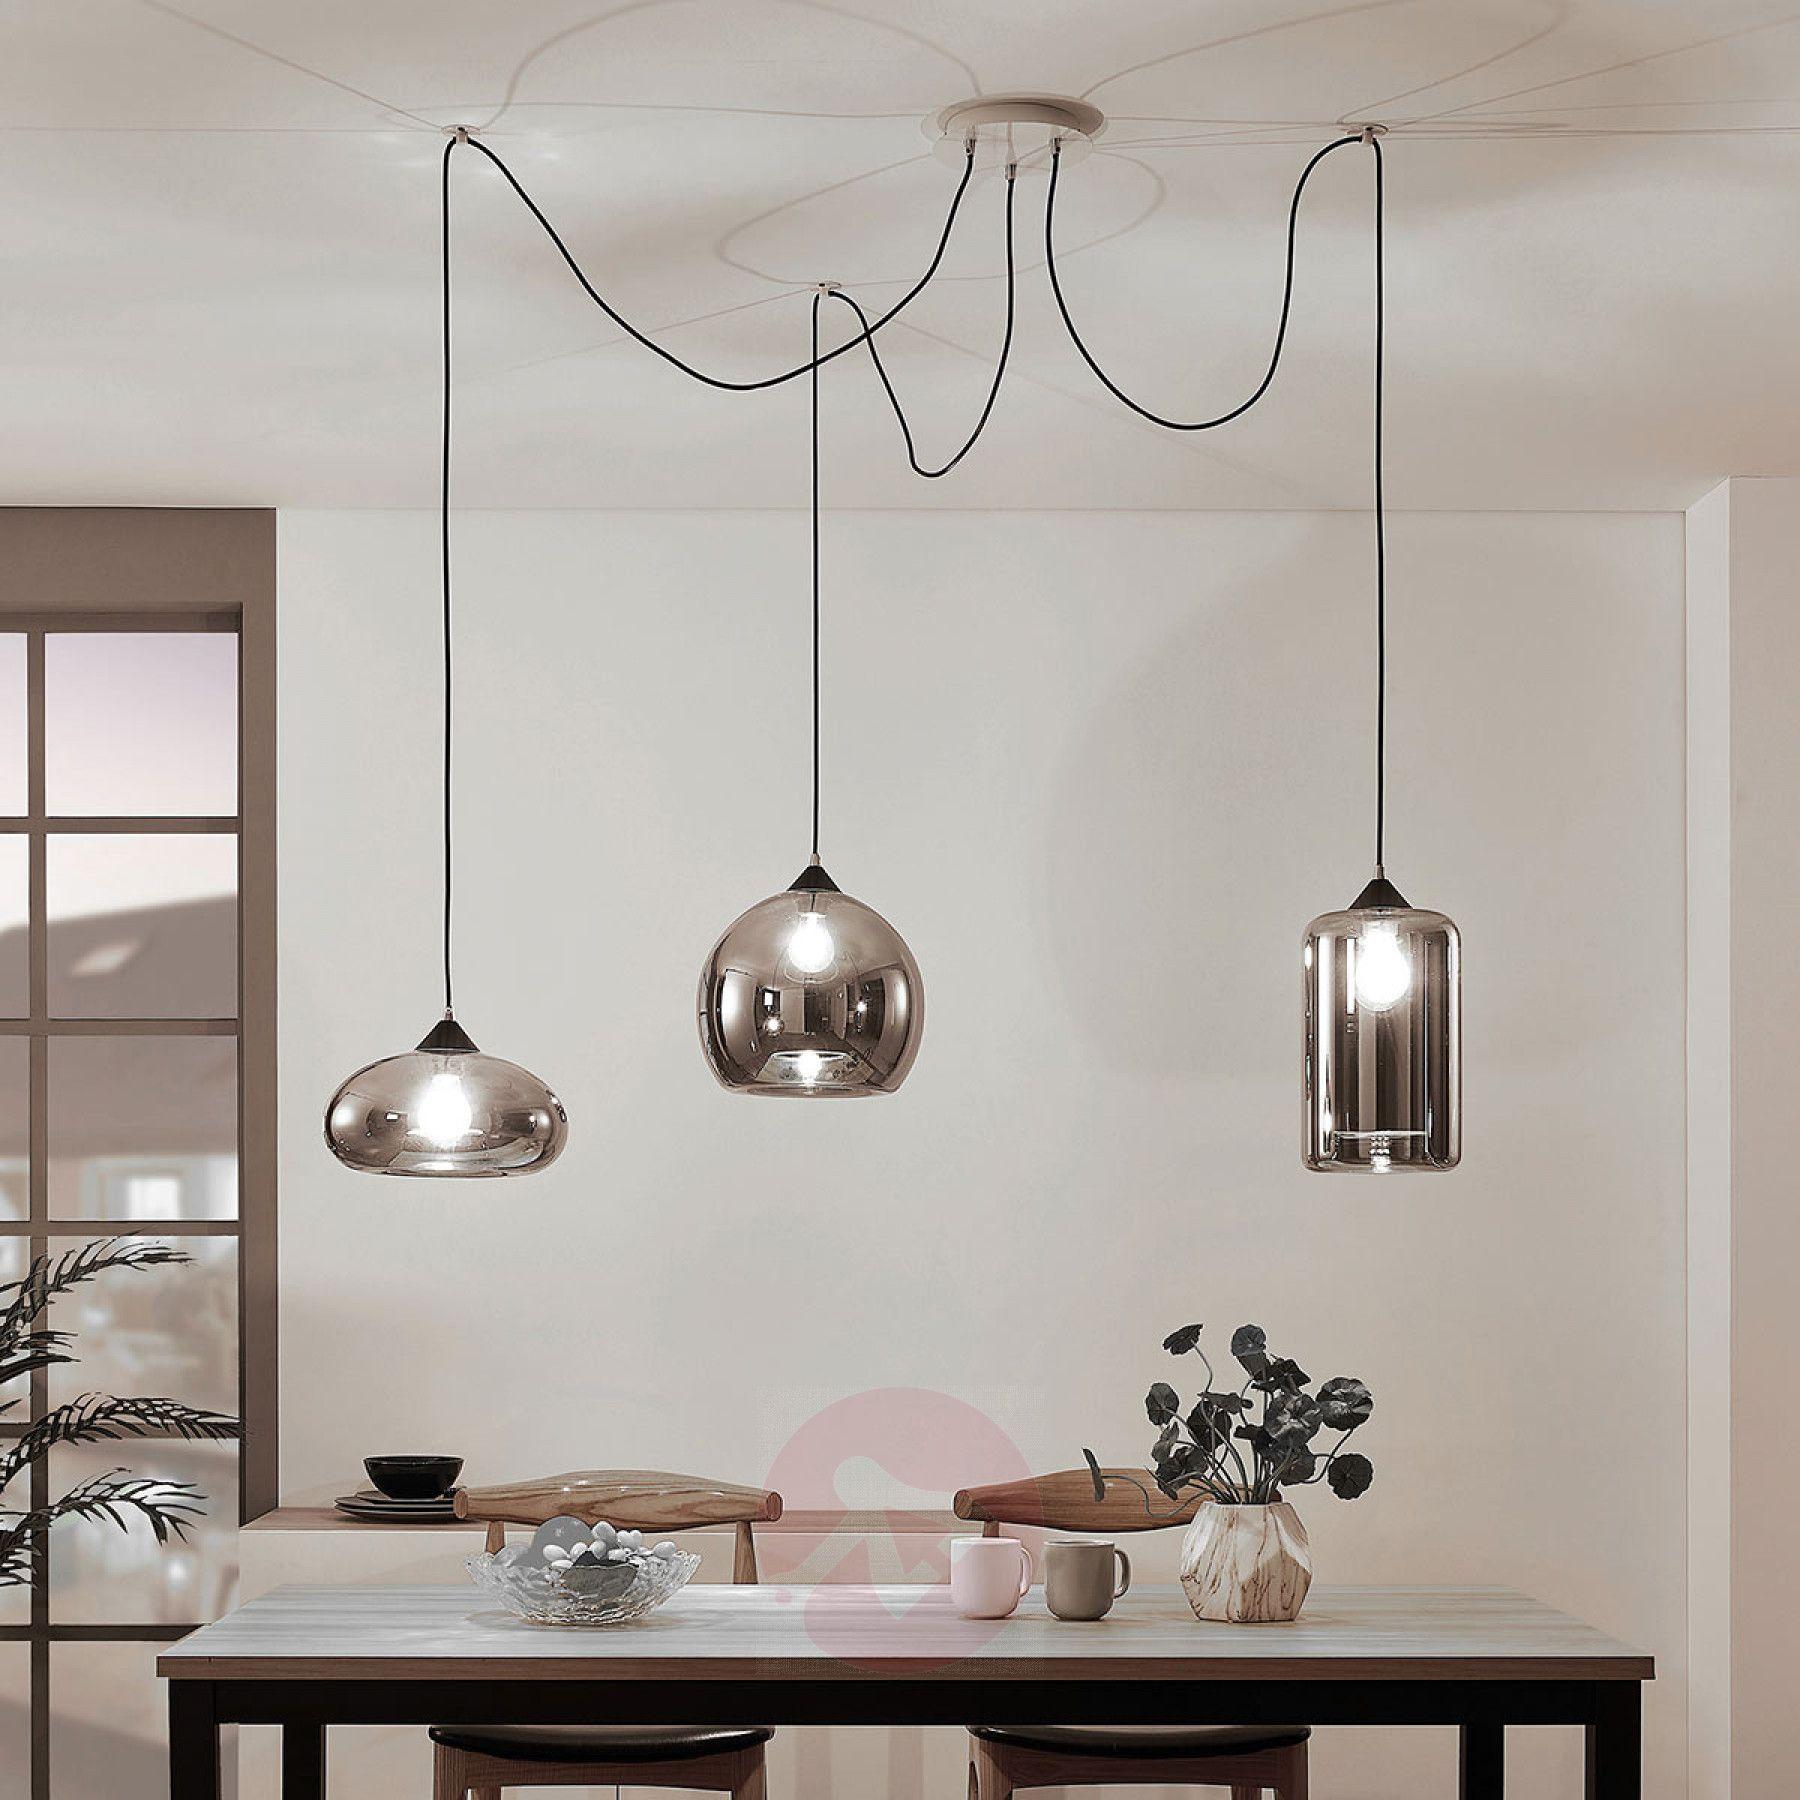 Hanglamp Raquel 3 Lamps Rookglazen Kappen Lampen24 Nl Hanglamp Moderne Lampen Vintage Lampen